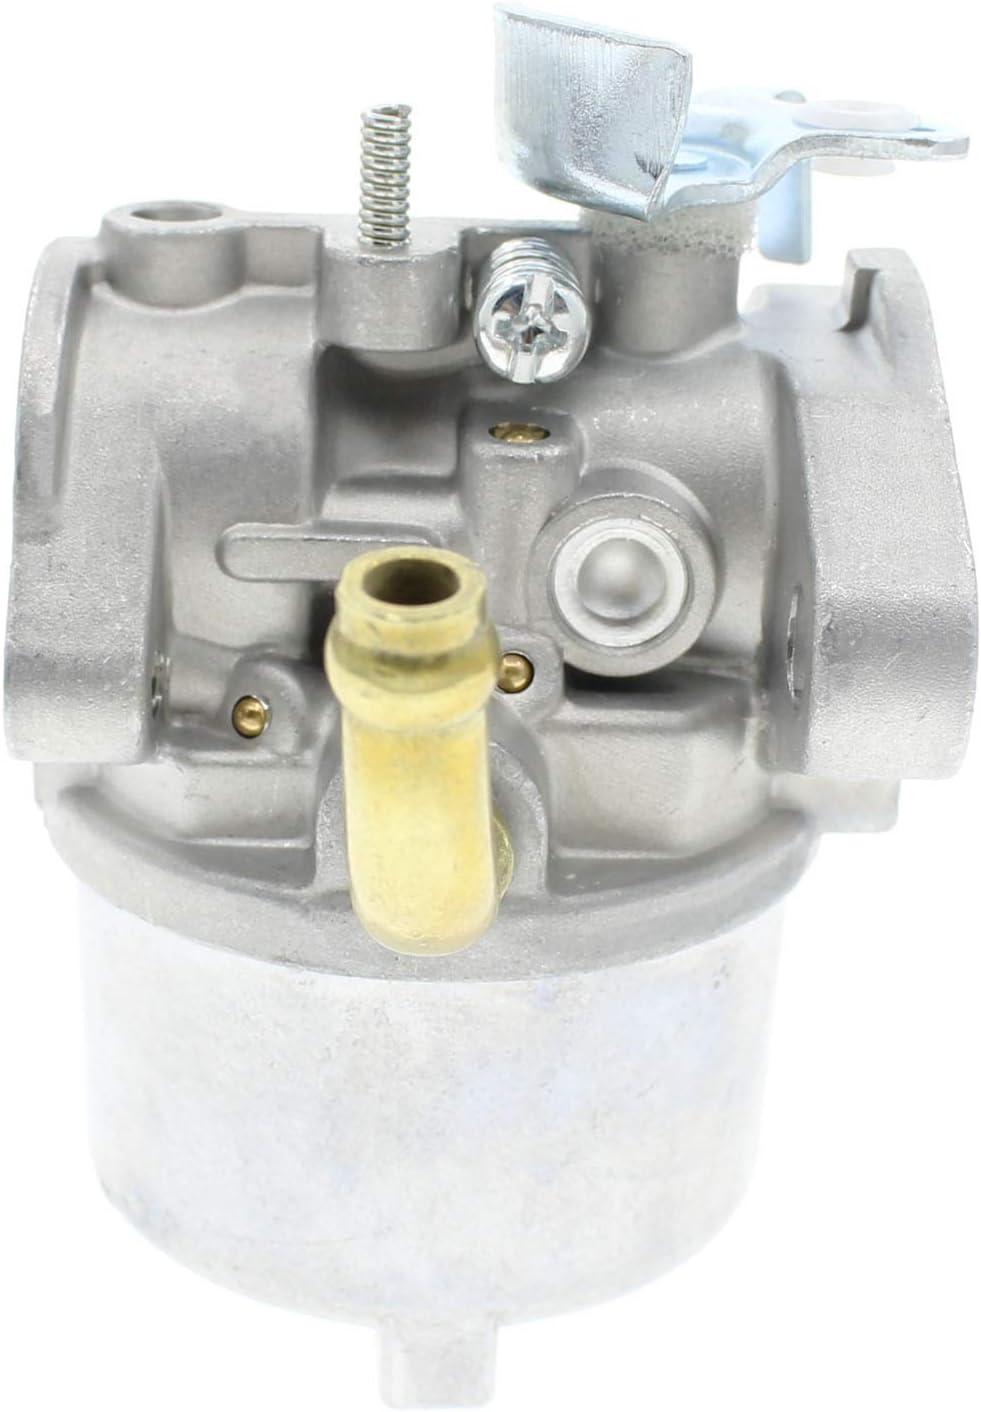 QAZAKY Carburetor Kit Replacement for Briggs /& Stratton 590907 594014 791955 794197 794588 798918 Craftsman 536.881851 Snowblower 8.5HP 15B100 15C100 15D100 15Z100 15Z300 Series Engine Lawnmower